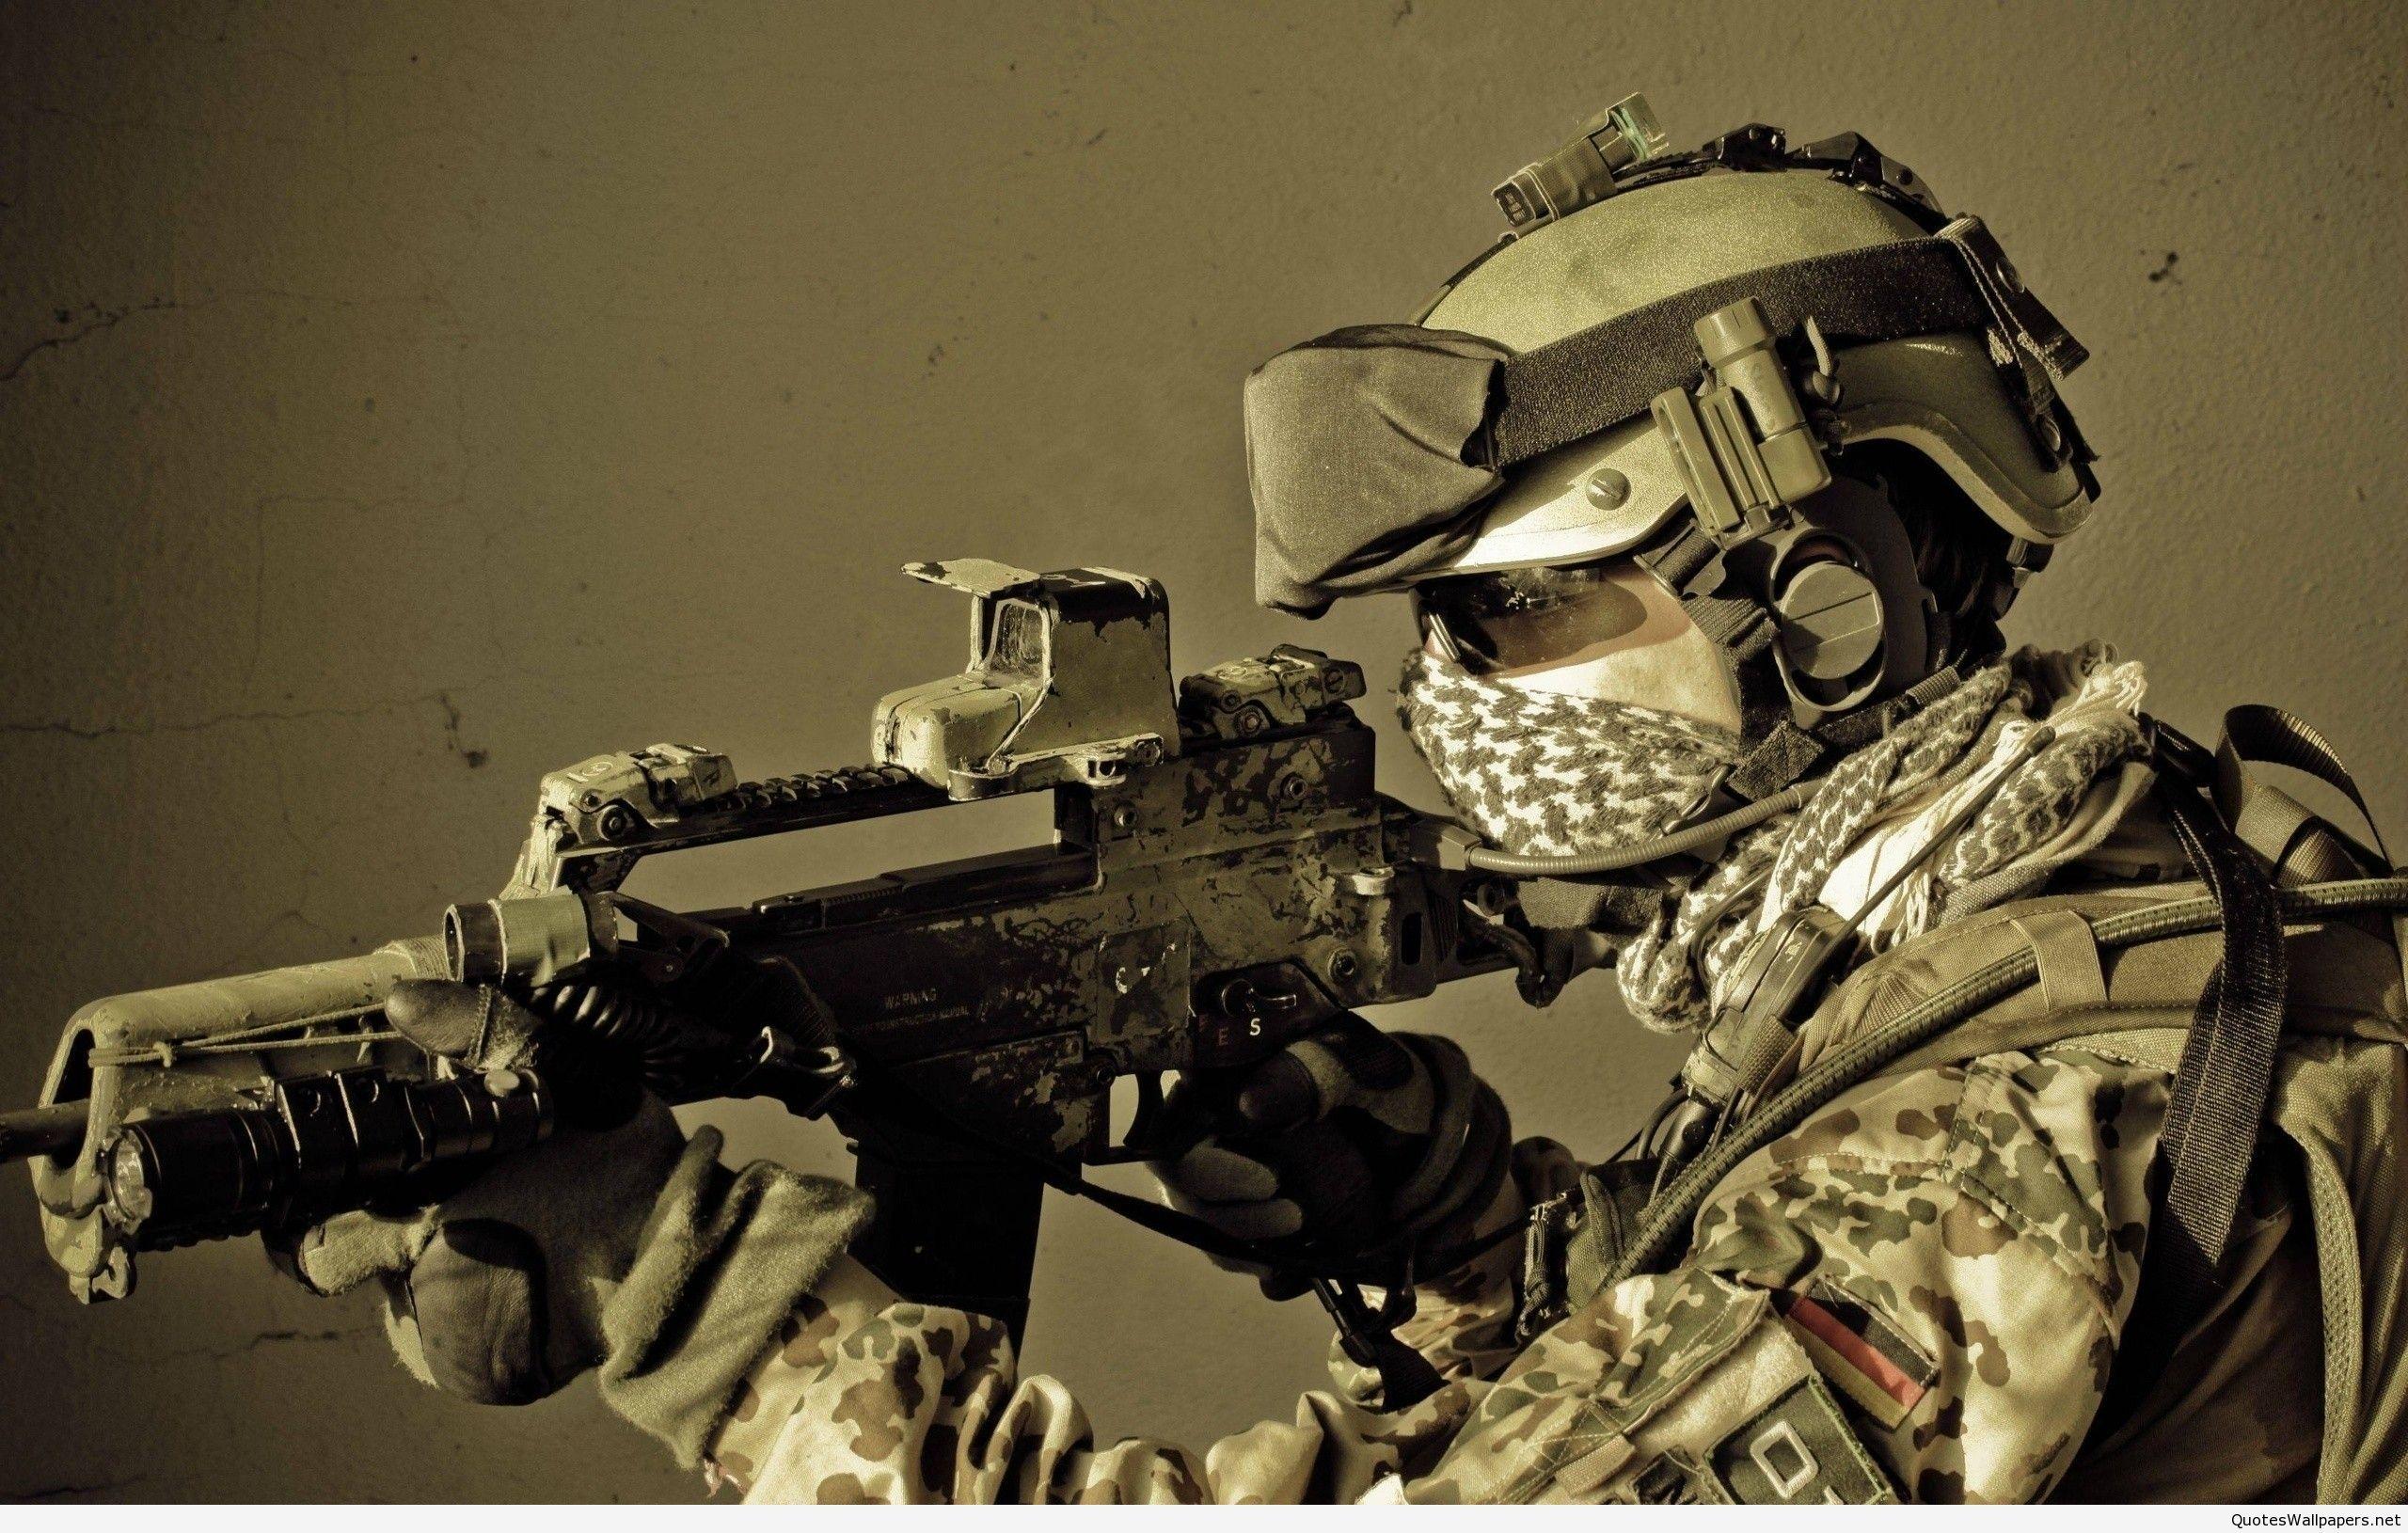 Cool army wallpaper desktop background kemecer military cool army wallpaper desktop background kemecer voltagebd Choice Image